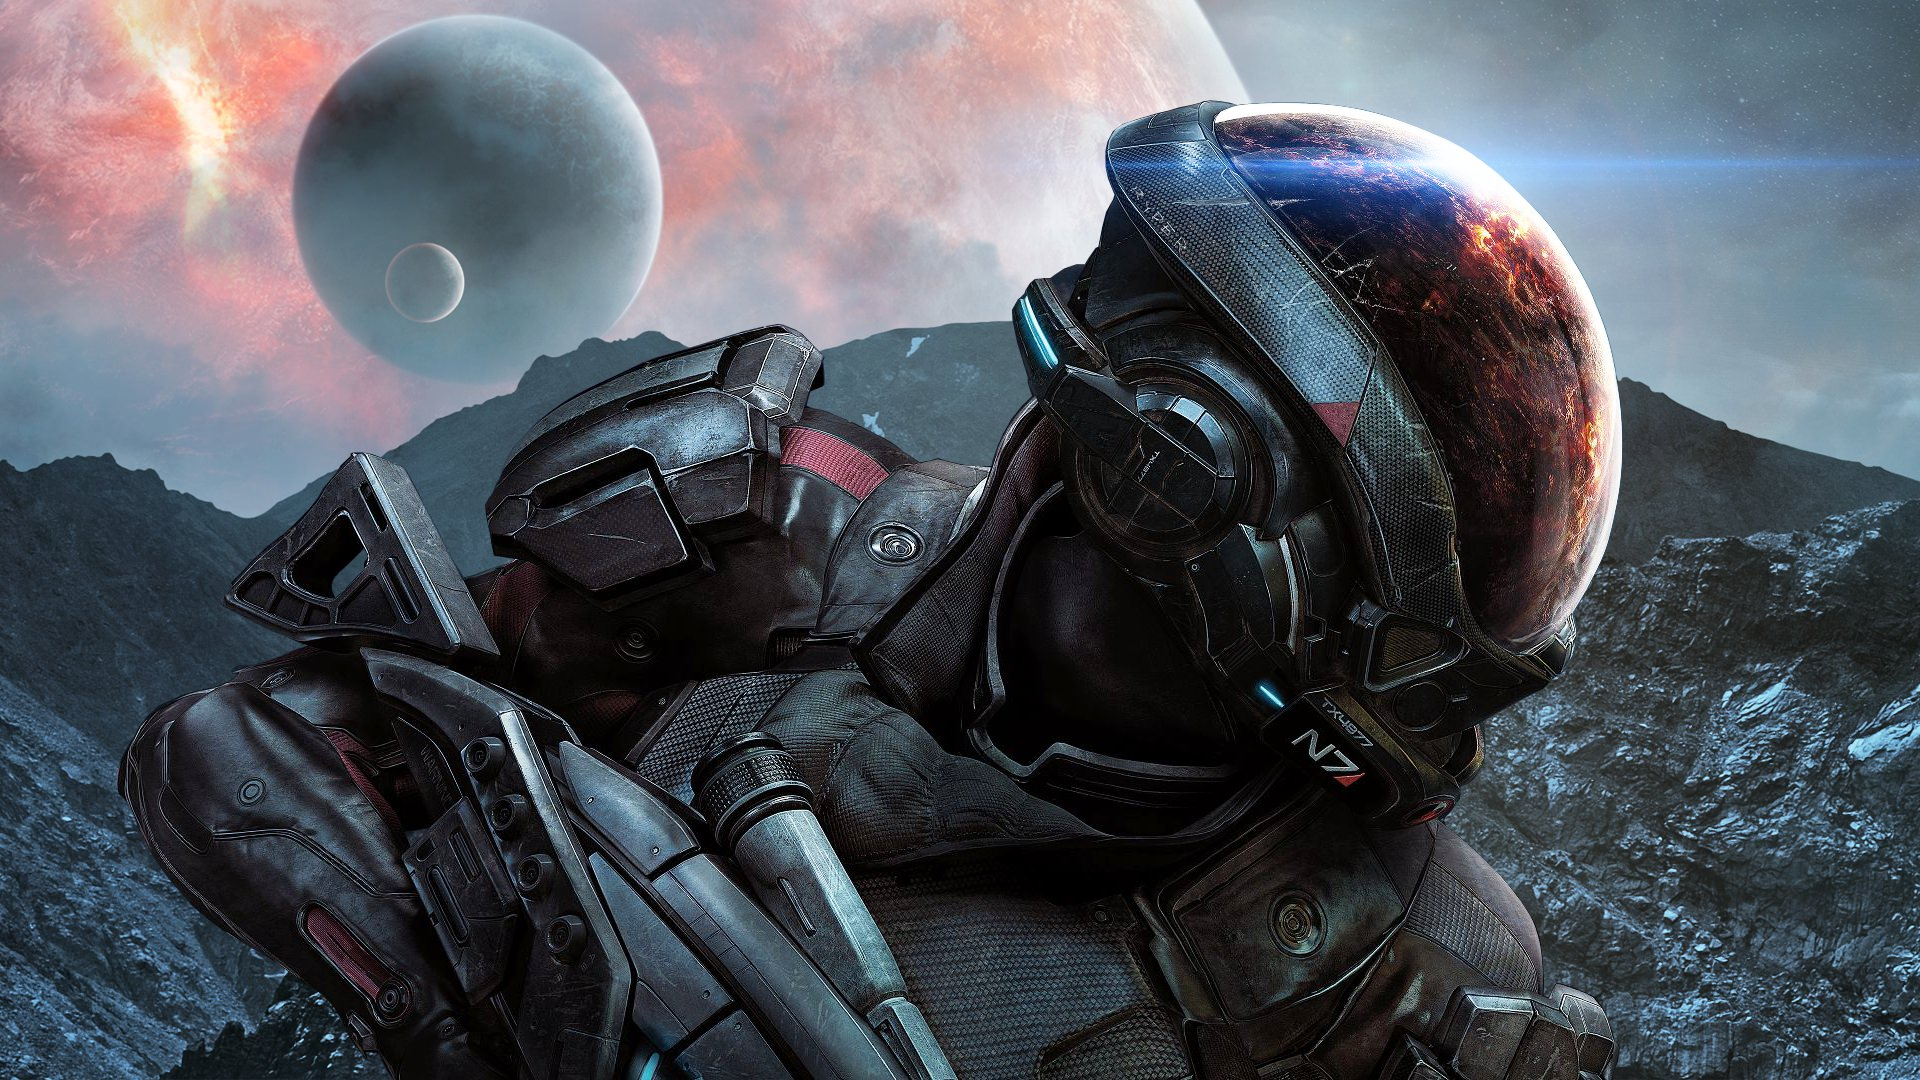 Mass Effect Andromeda Ryder Wallpaper